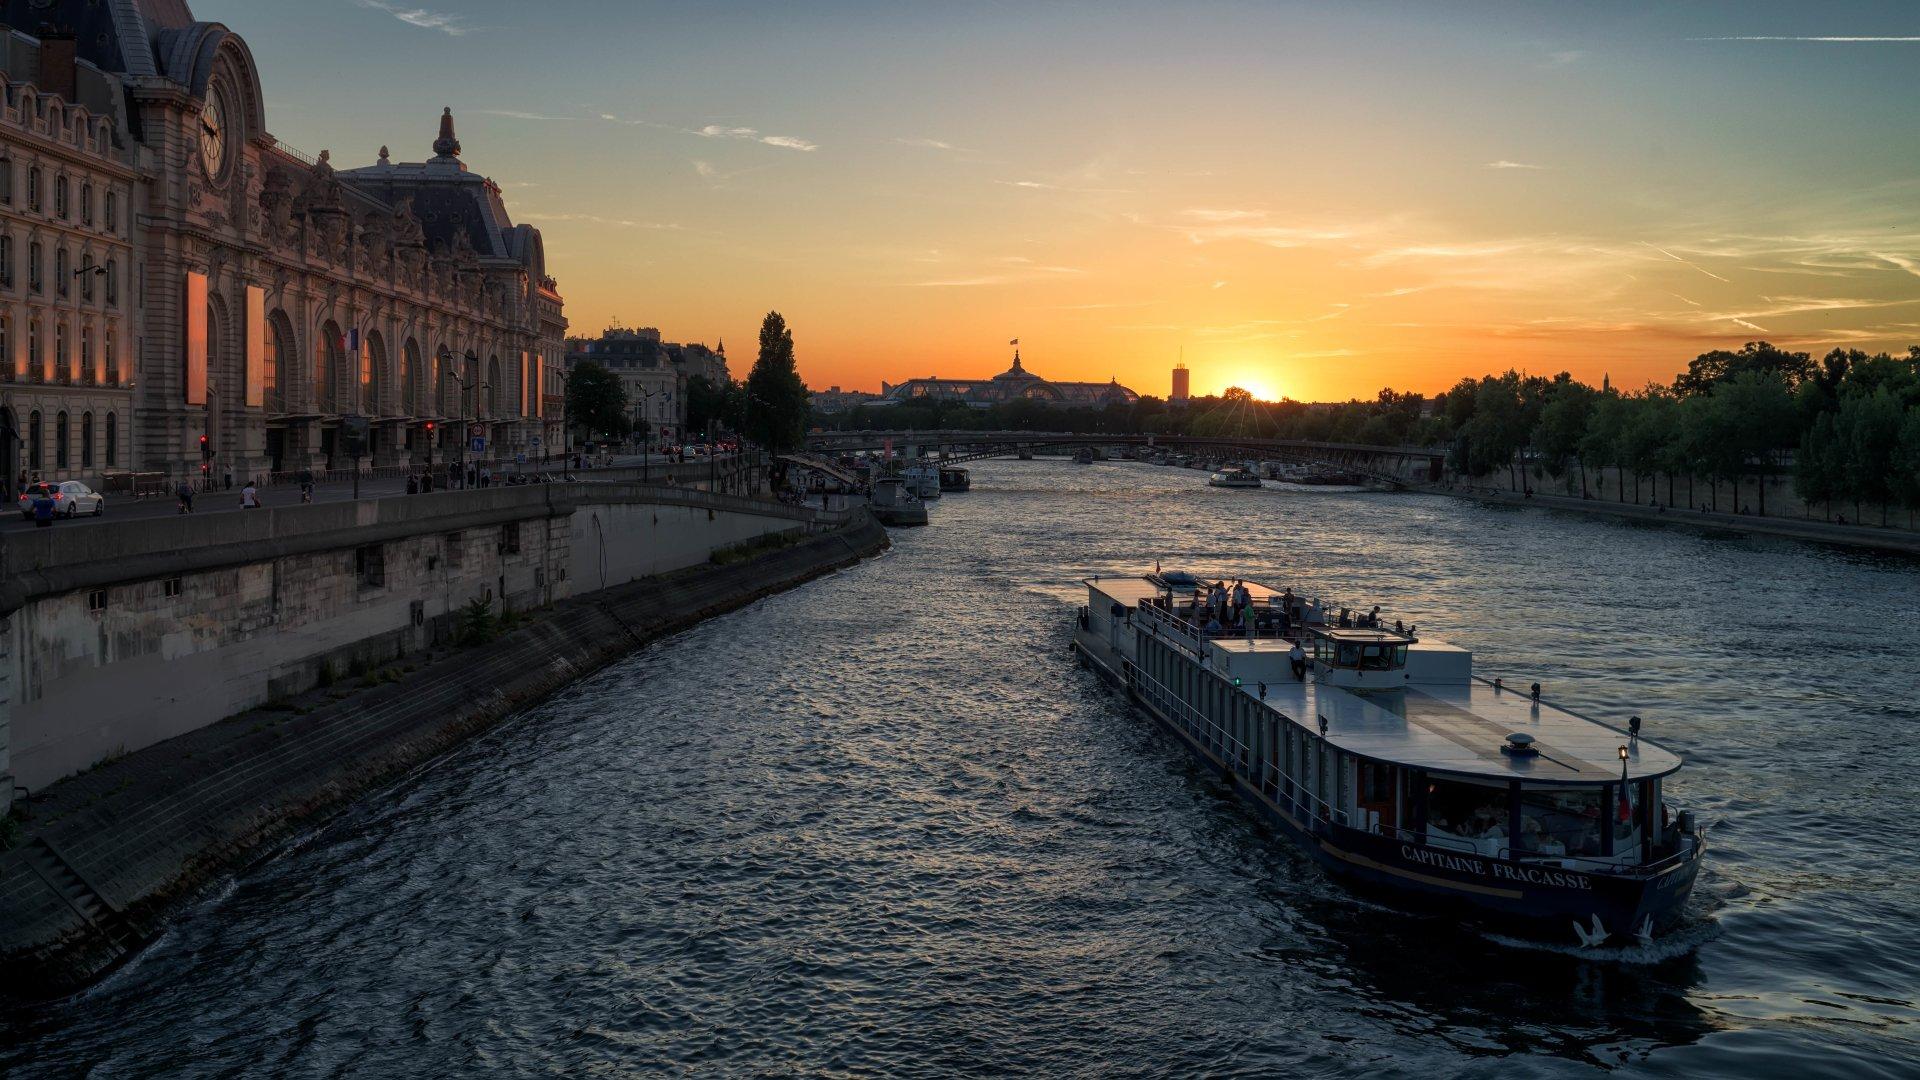 Man Made - Paris  River France Sunset Evening Boat Ship Seine Passenger Ship Wallpaper